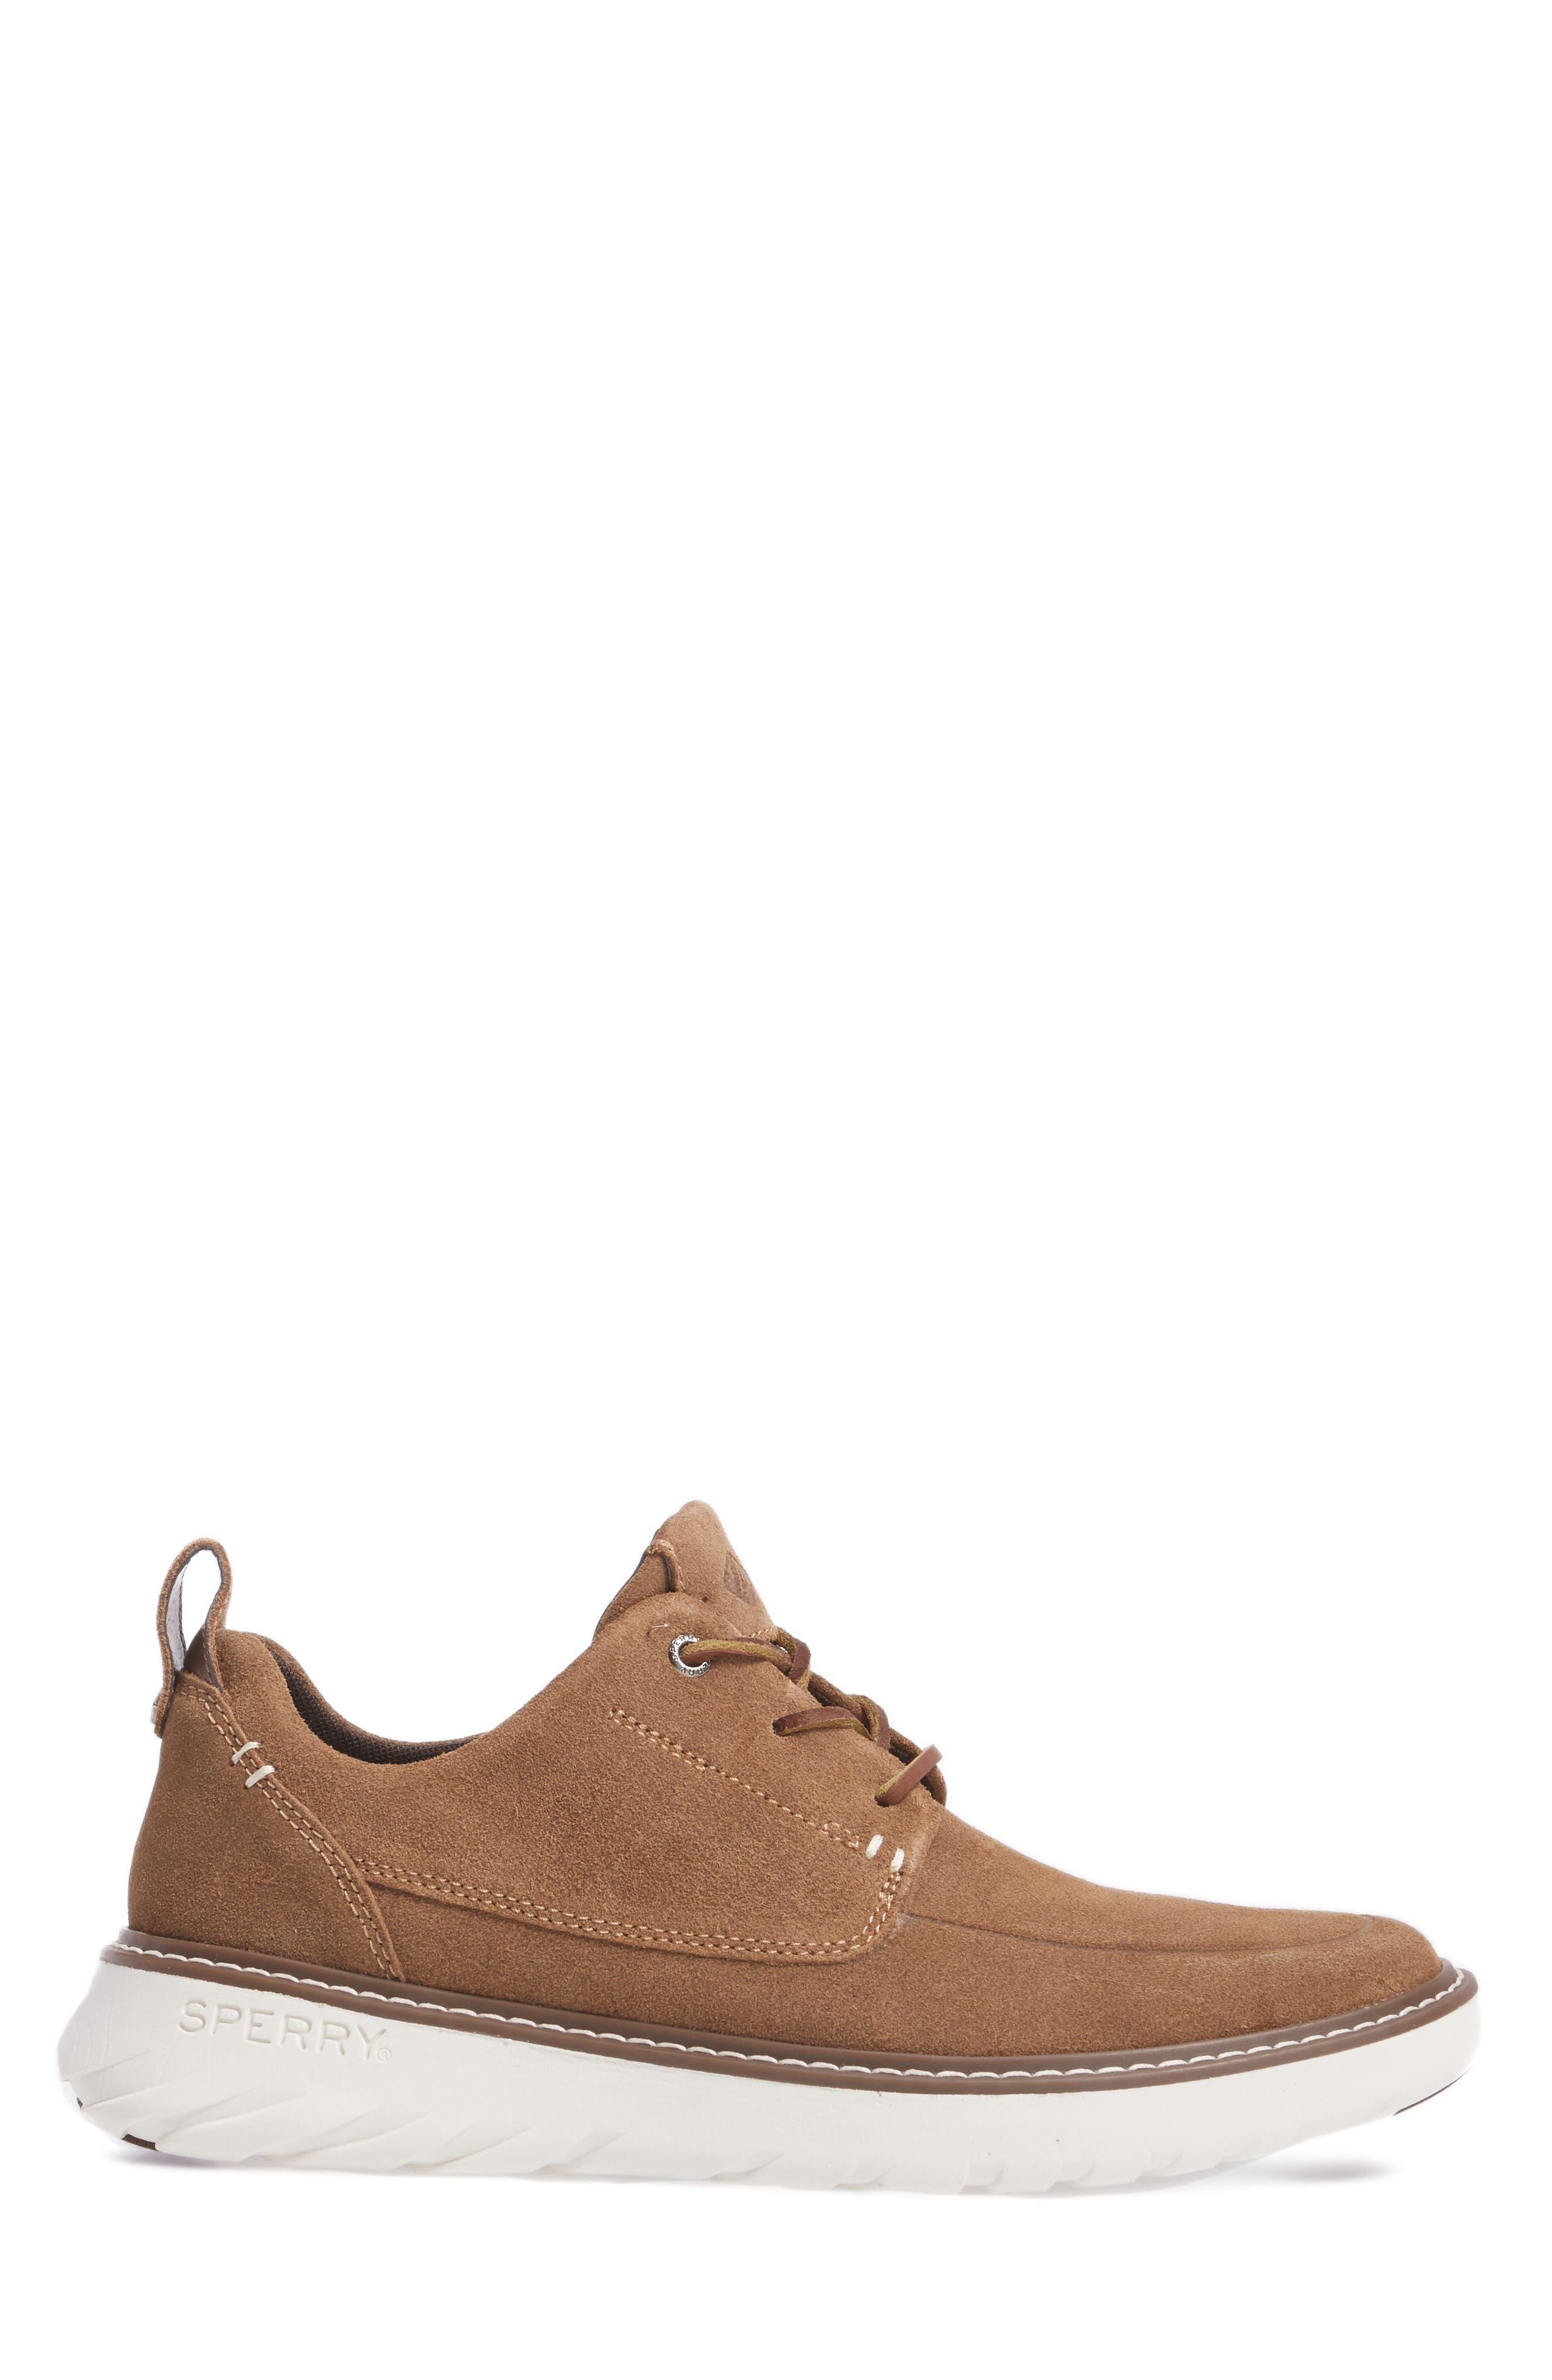 Element Chukka Boot,                             Alternate thumbnail 3, color,                             Carmel Leather